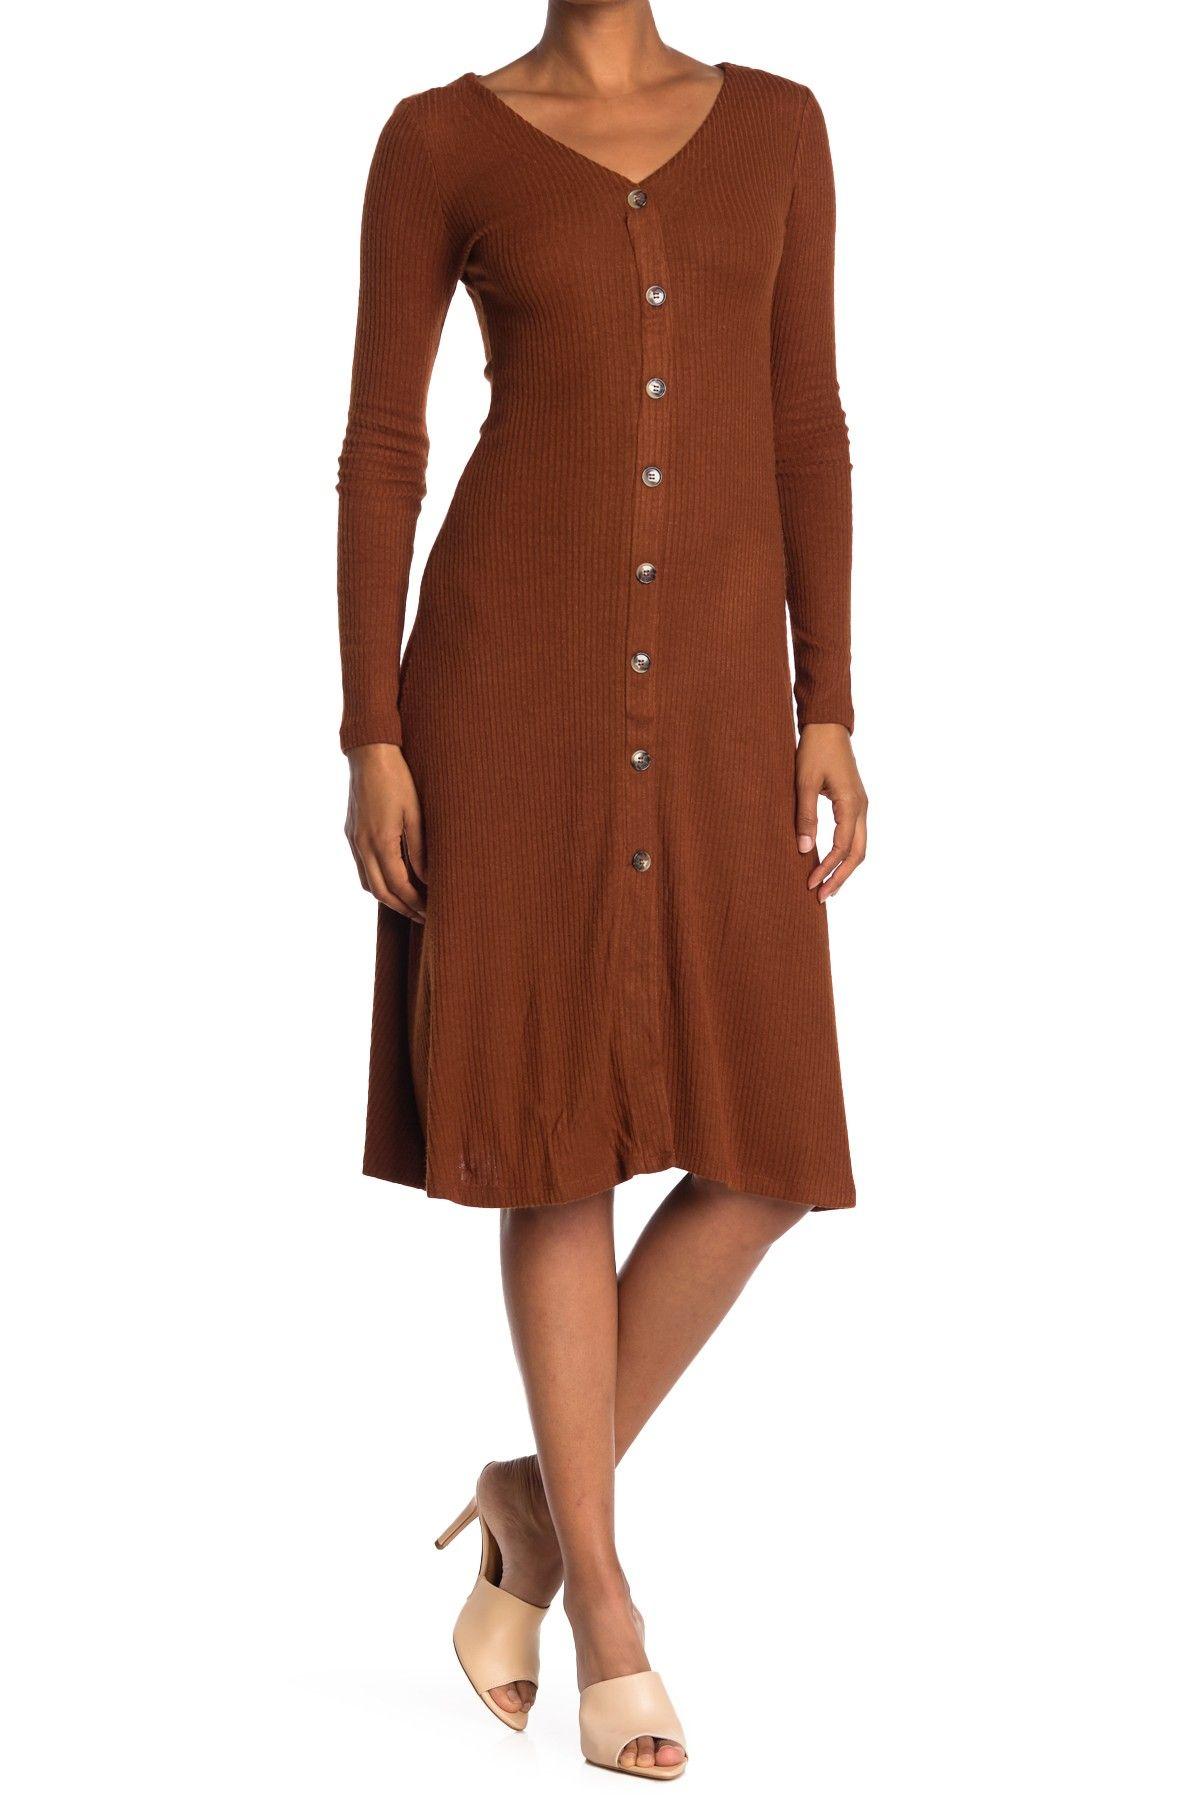 Double Zero V Neck Long Sleeve Button Down Sweater Dress Nordstrom Rack Ribbed Knit Dress Dresses Nordstrom Dresses [ 1800 x 1200 Pixel ]